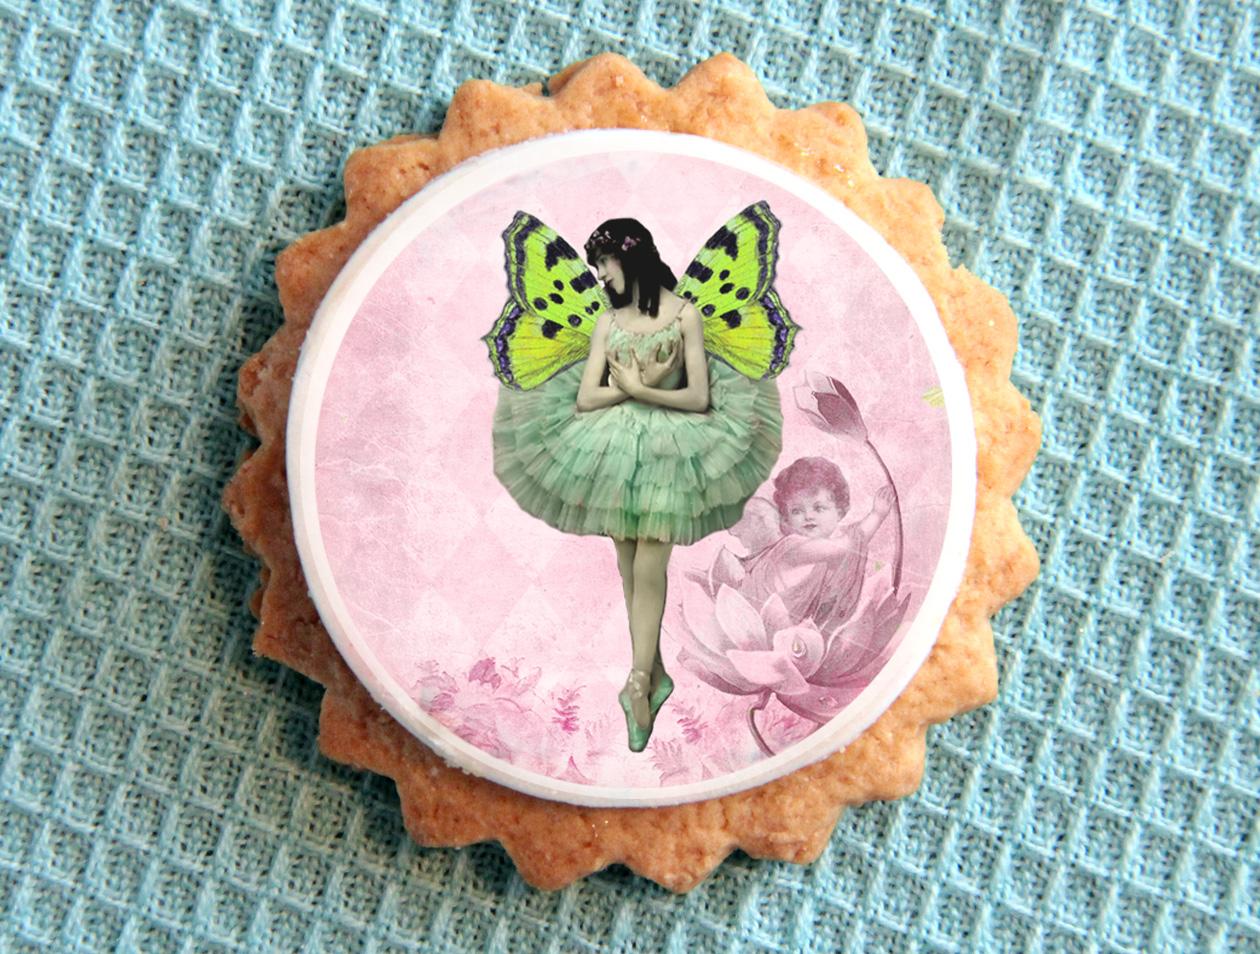 Edible Cake Images New Zealand : Edible wafer paper Ballet Fairies Felt